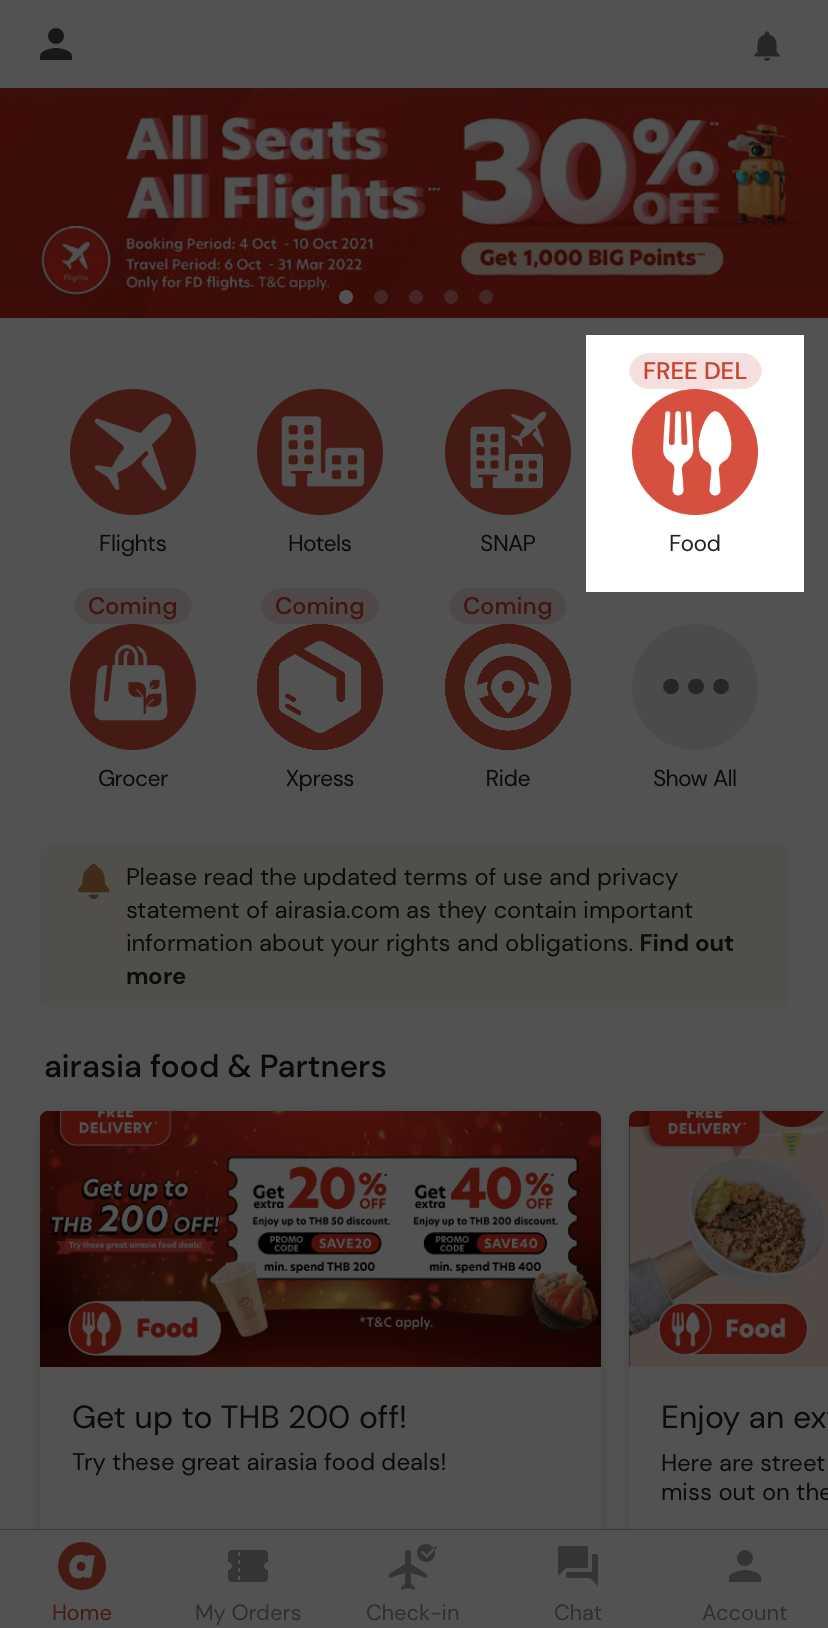 airasia food2